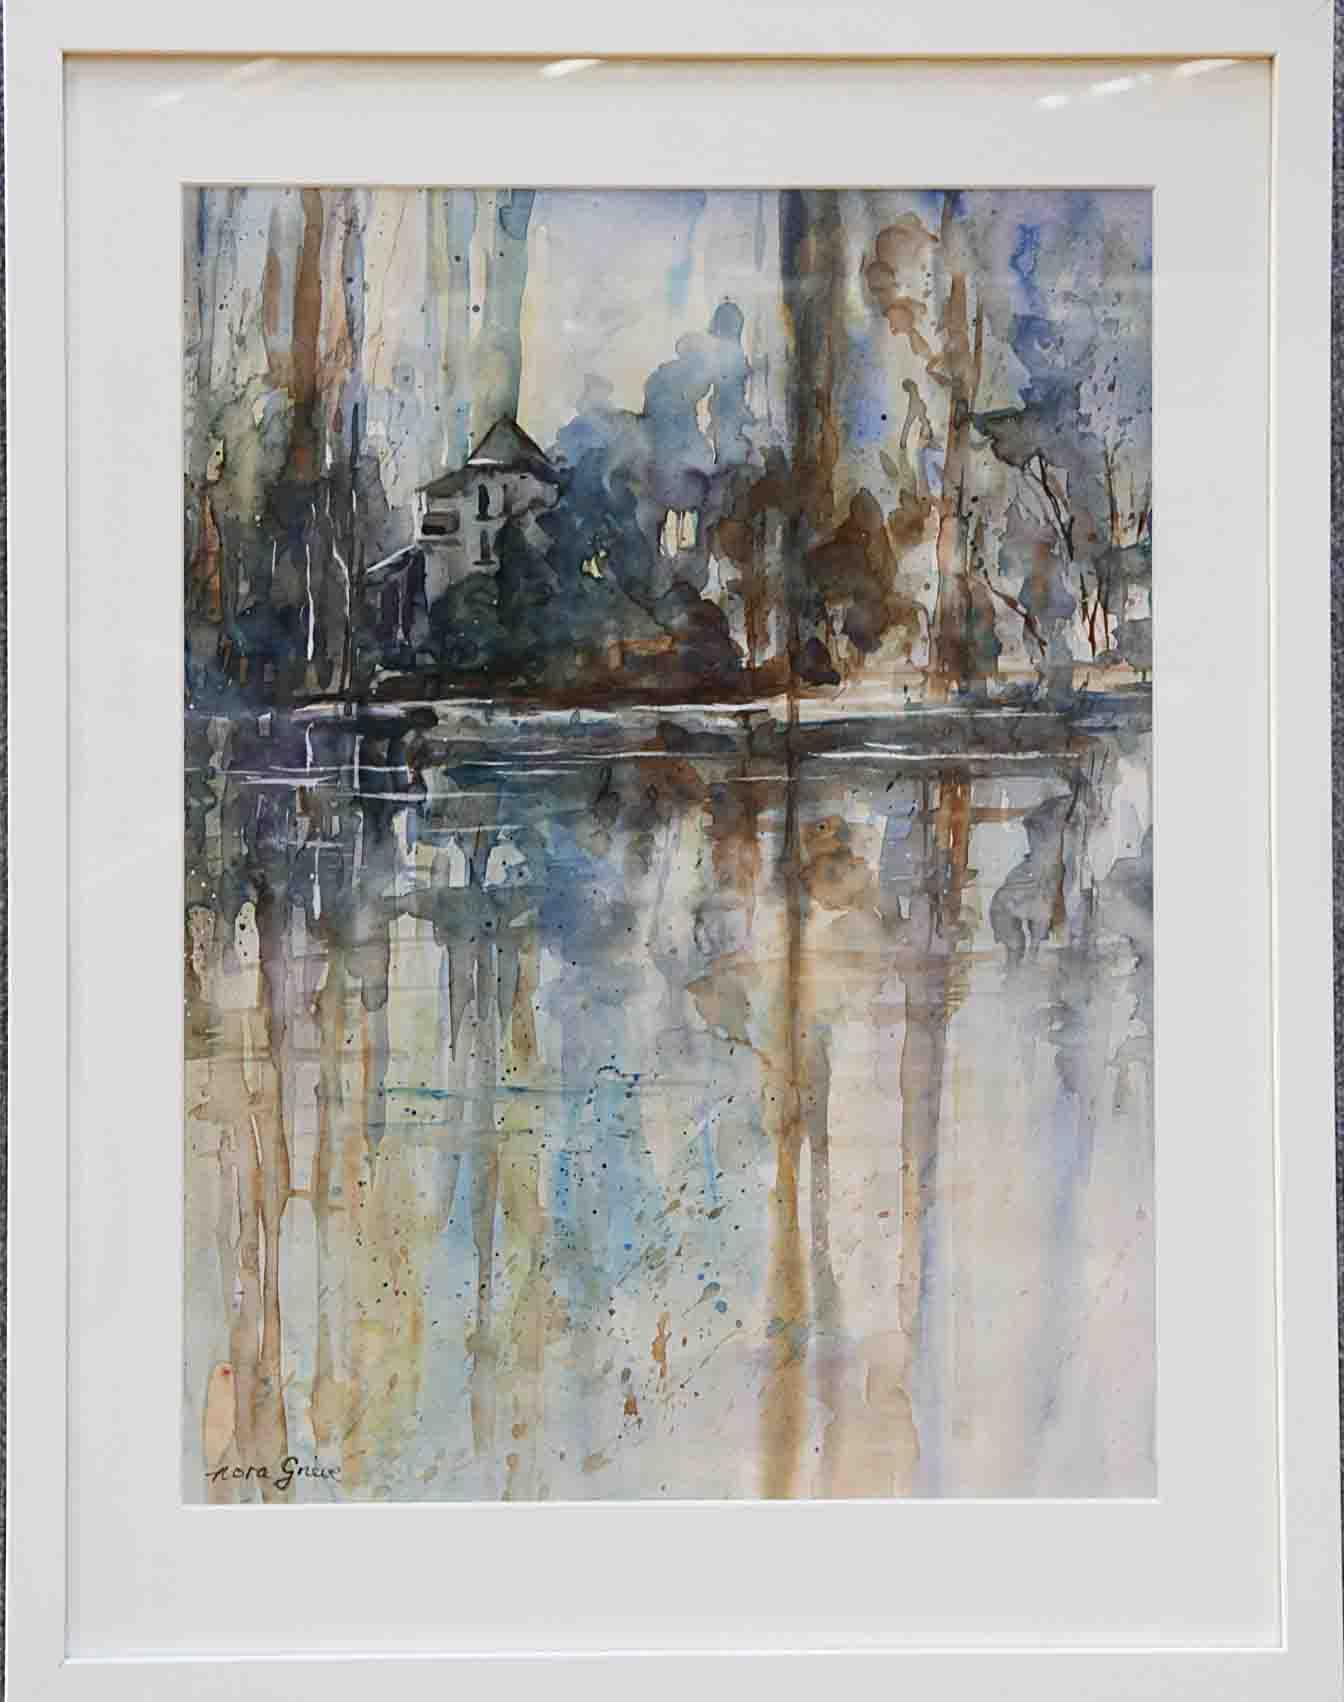 Watercolour-Nora Grieve-Lakeside.jpg